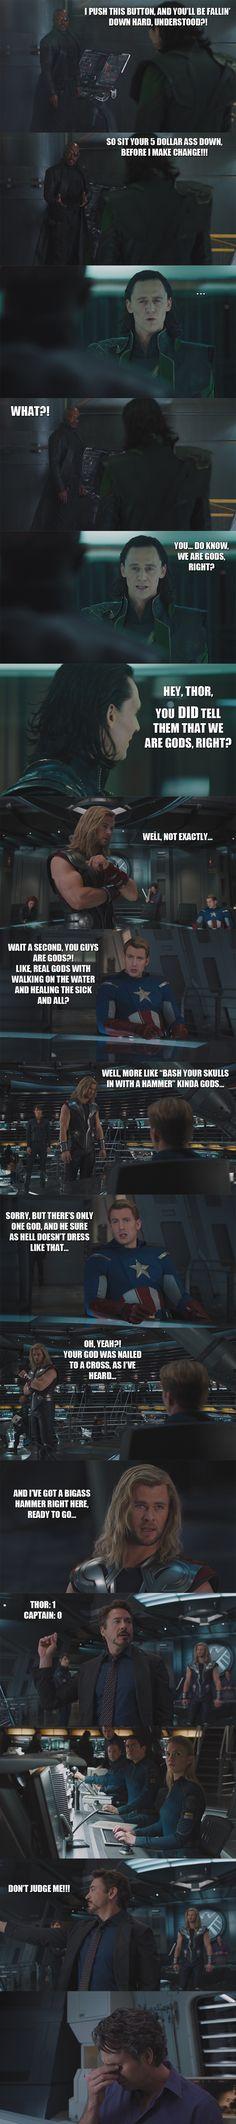 Thor: 1 Captain: 0 The Avengers - Gods: I by yourparodies.deviantart.com